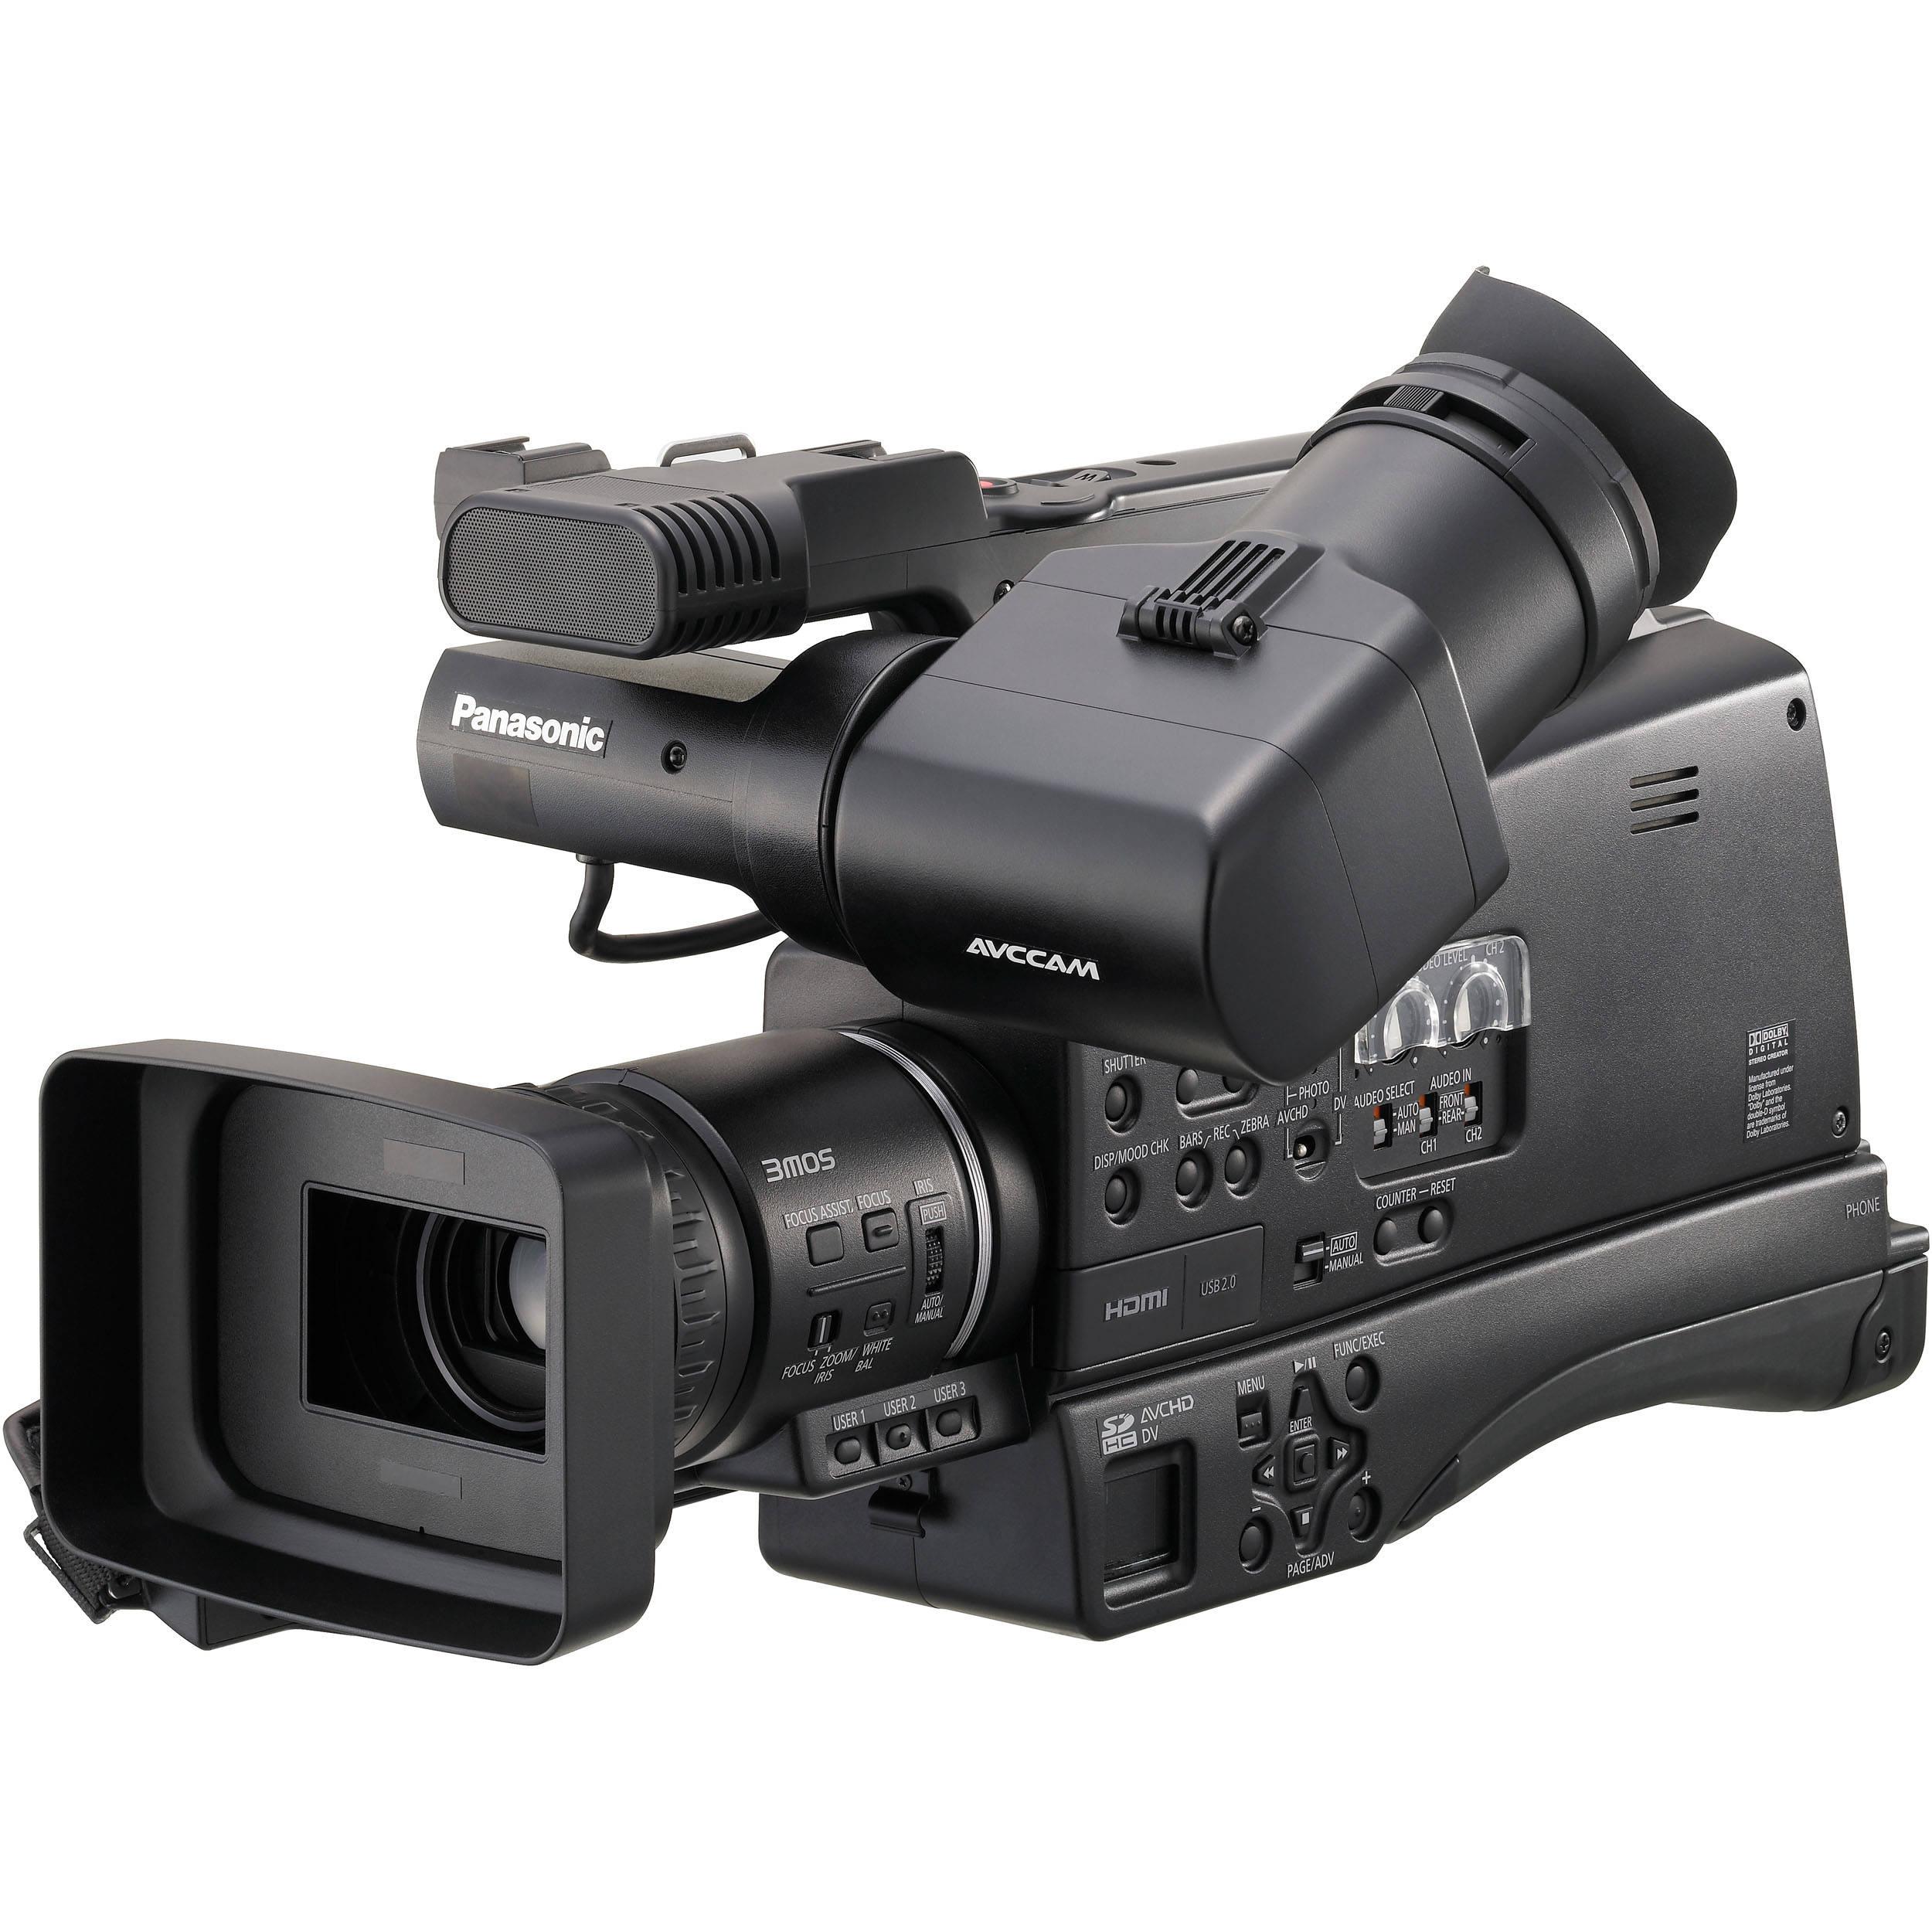 Panasonic ag-hmc80 (ag-hmc80e, ag-hmc81e, ag-hmc82, ag-hmc82en.